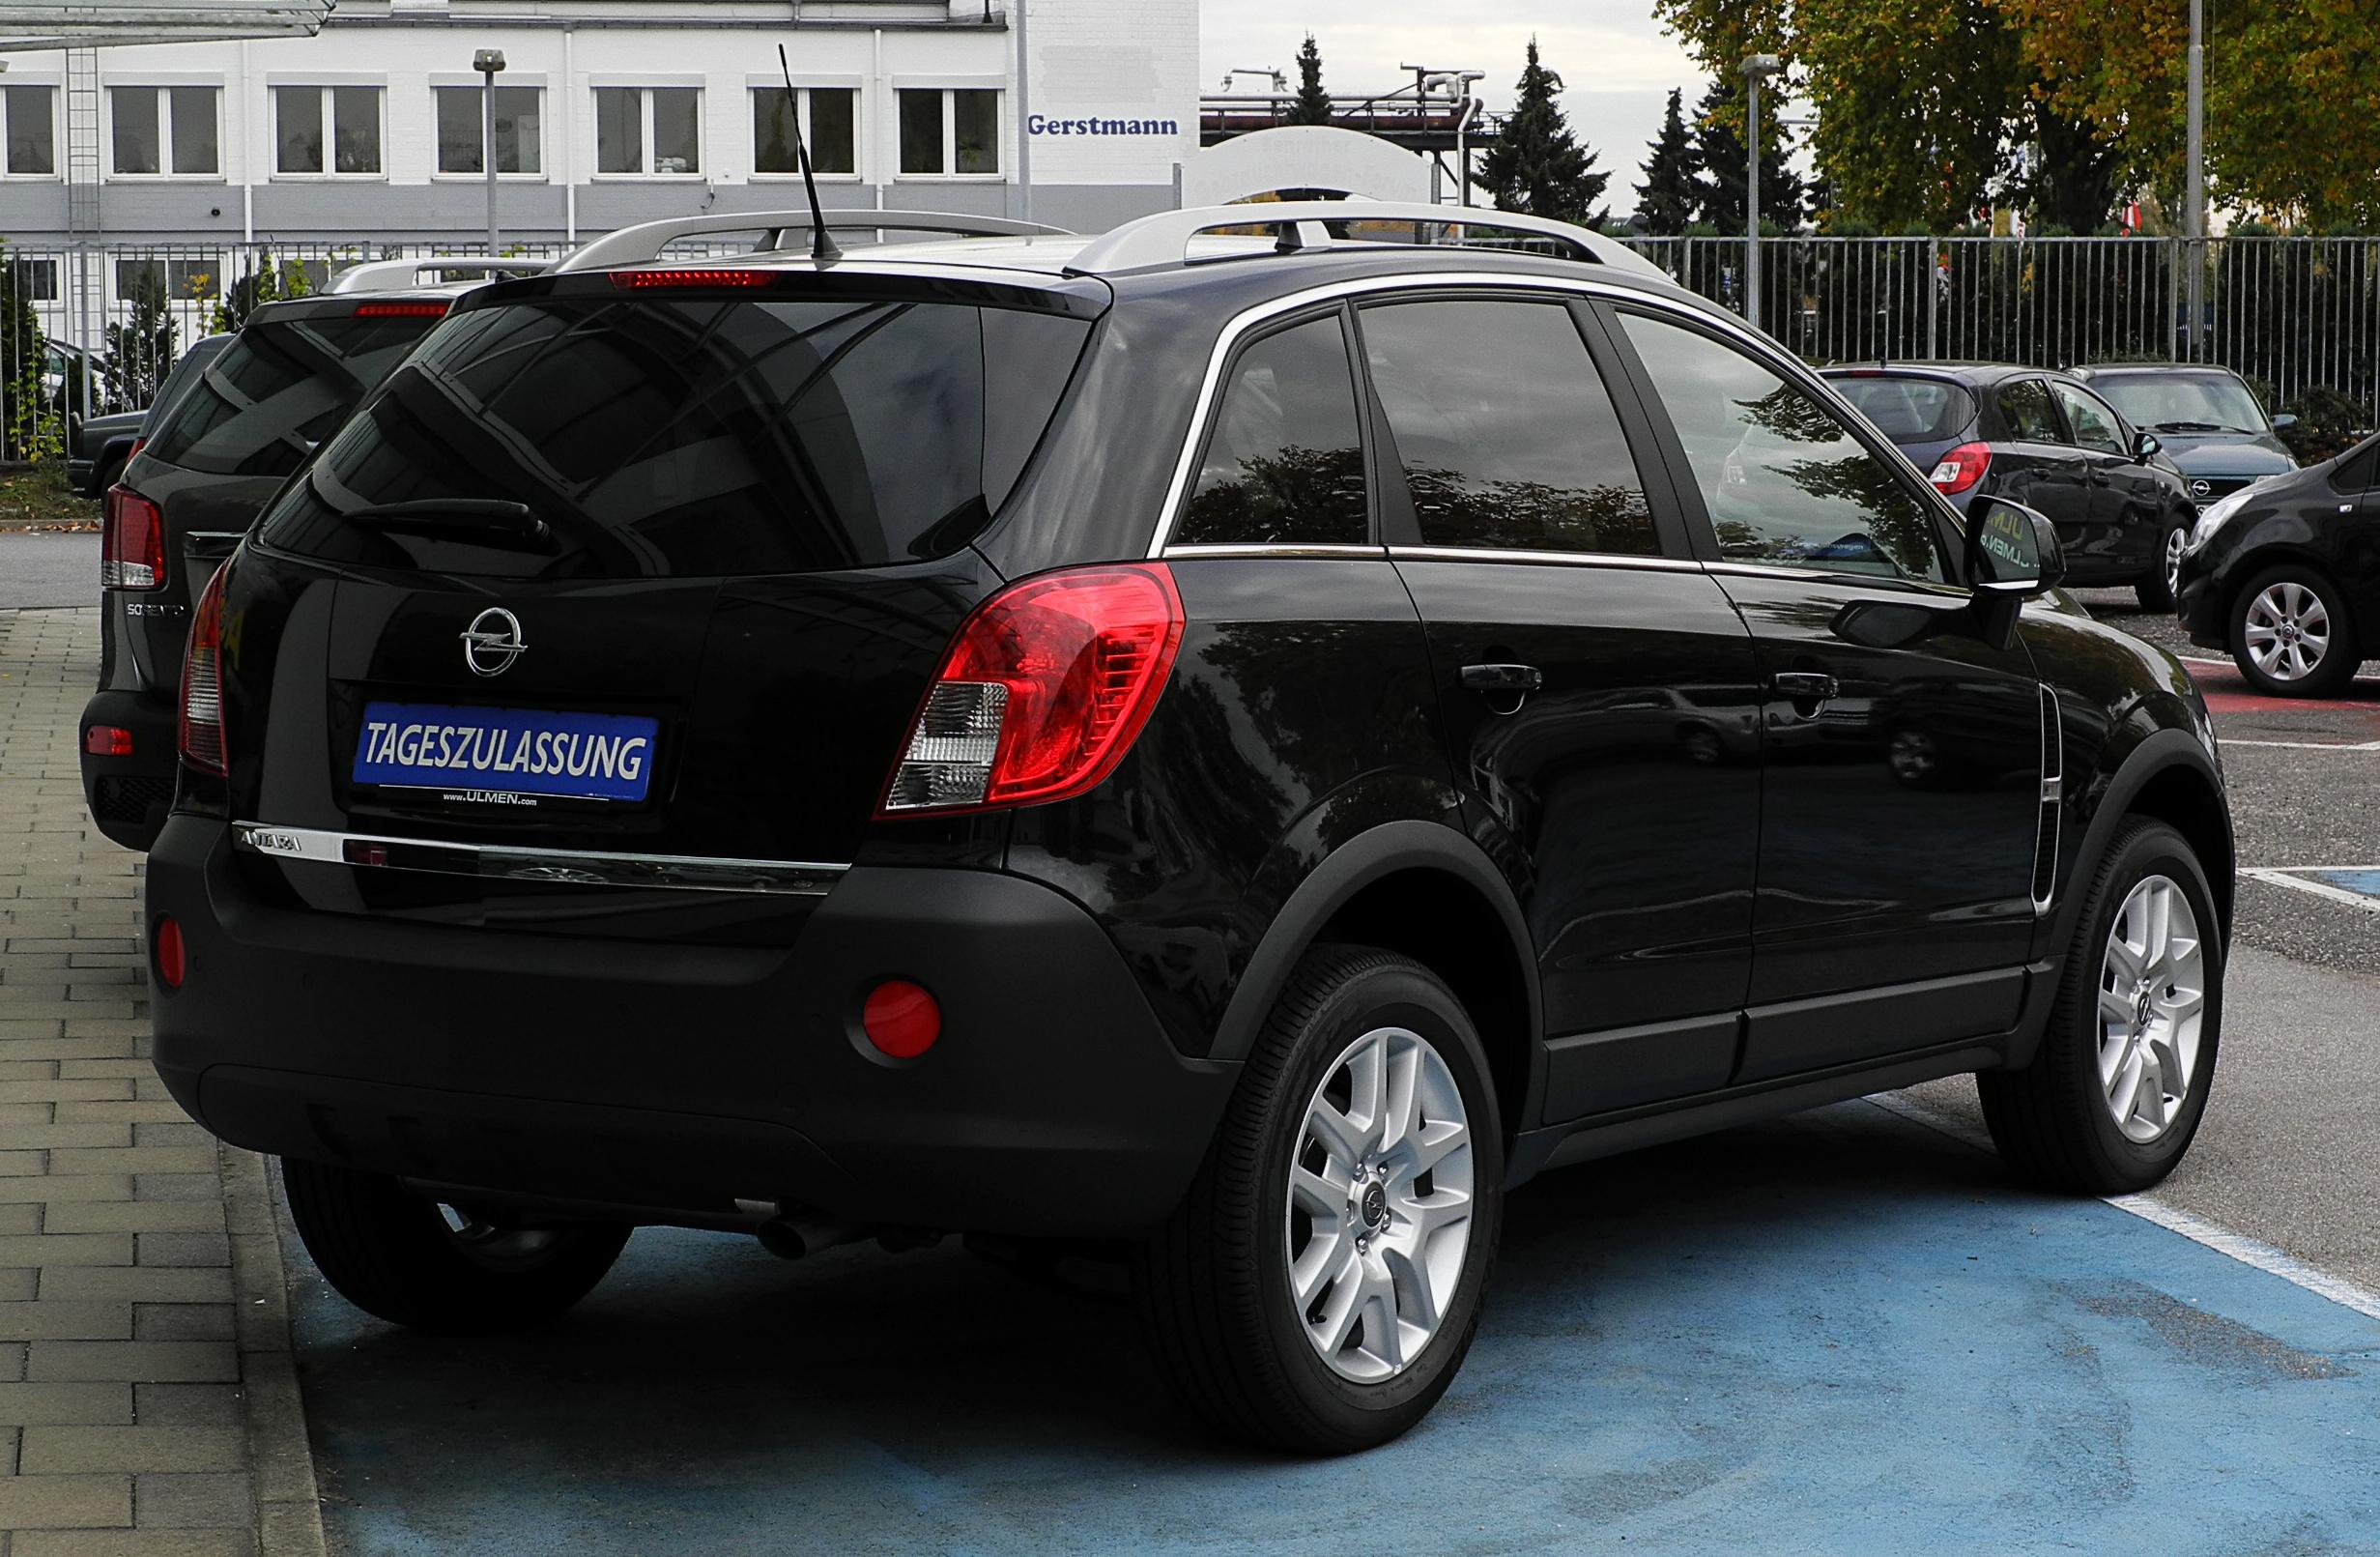 File:Opel Antara 2.4 4x4 Design Edition (Facelift ...